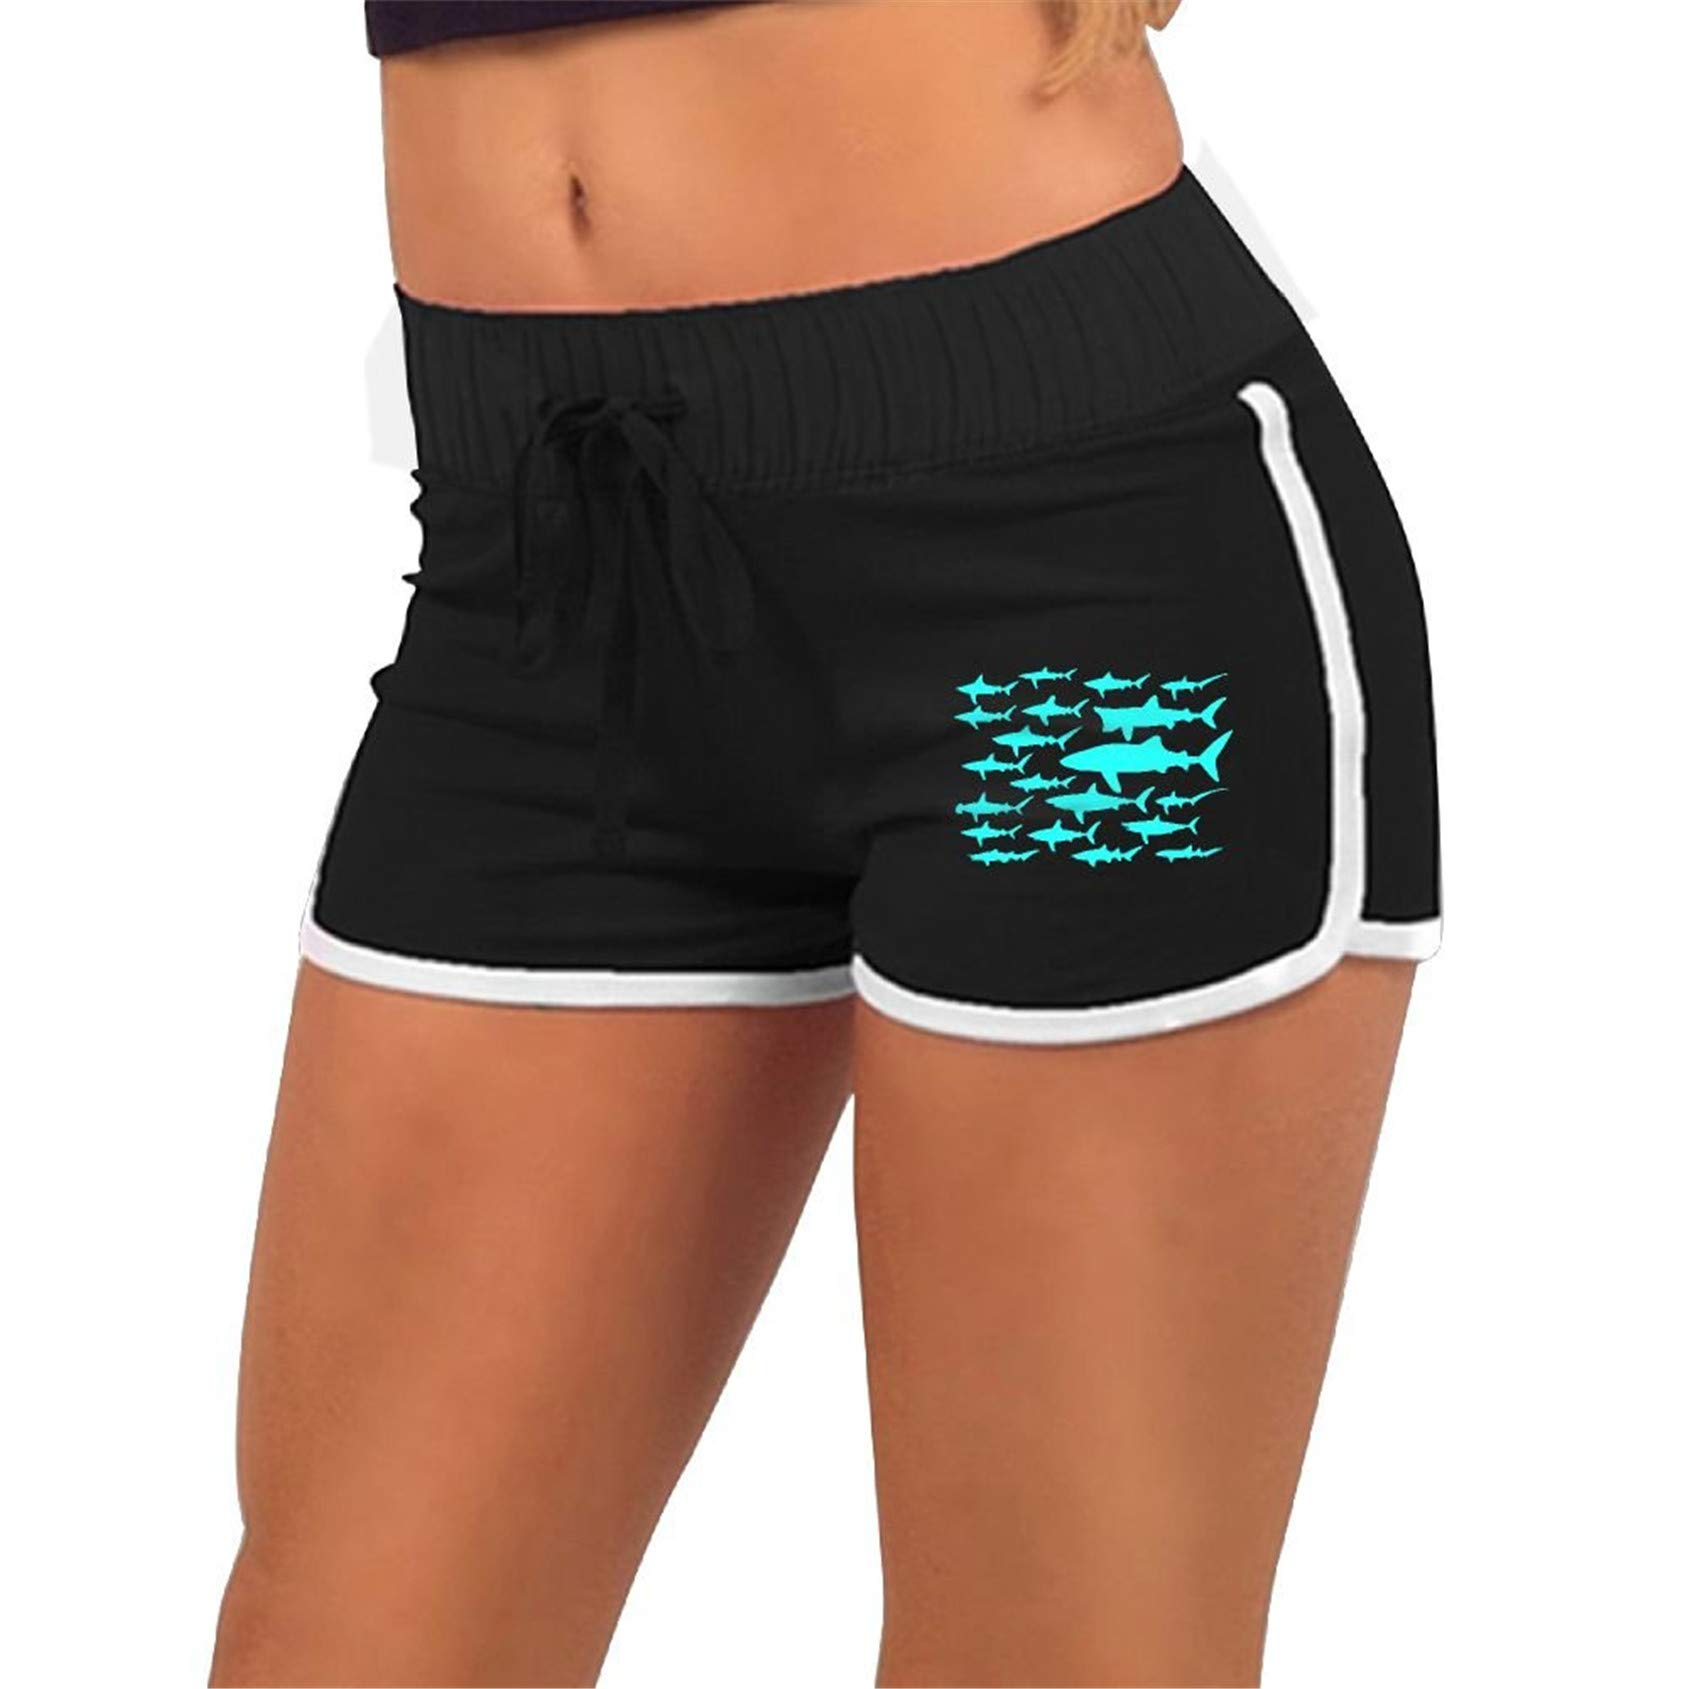 Ocean Shark,Yoga,Running,Workout Short Pants with,Athletic Elastic Waist Womens Sports Shorts